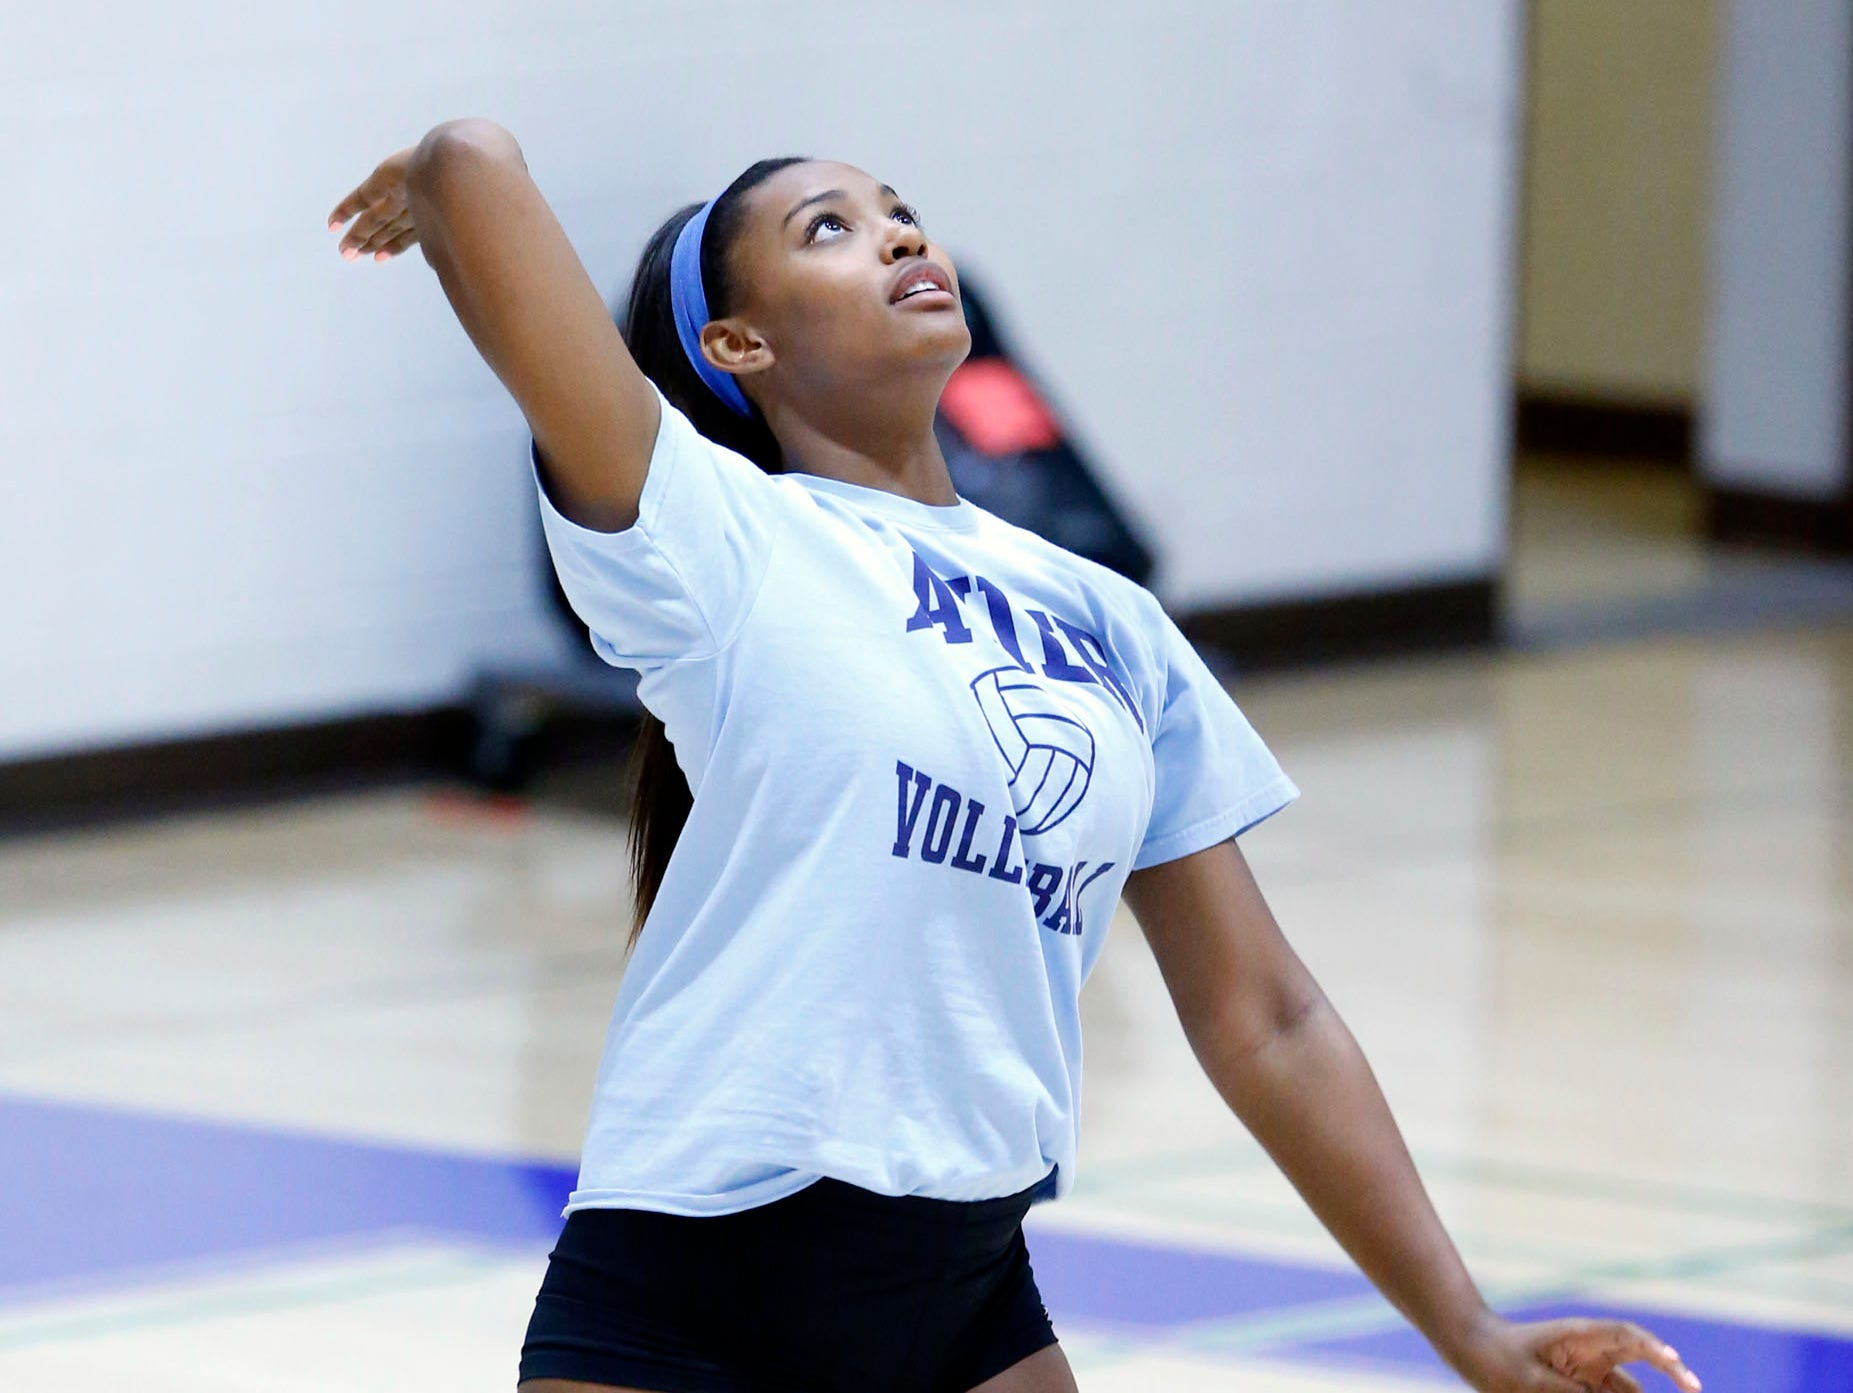 Phoenix Xavier volleyball player Khalia Lanier serves on Wednesday, Sept. 2, 2015, in Phoenix.